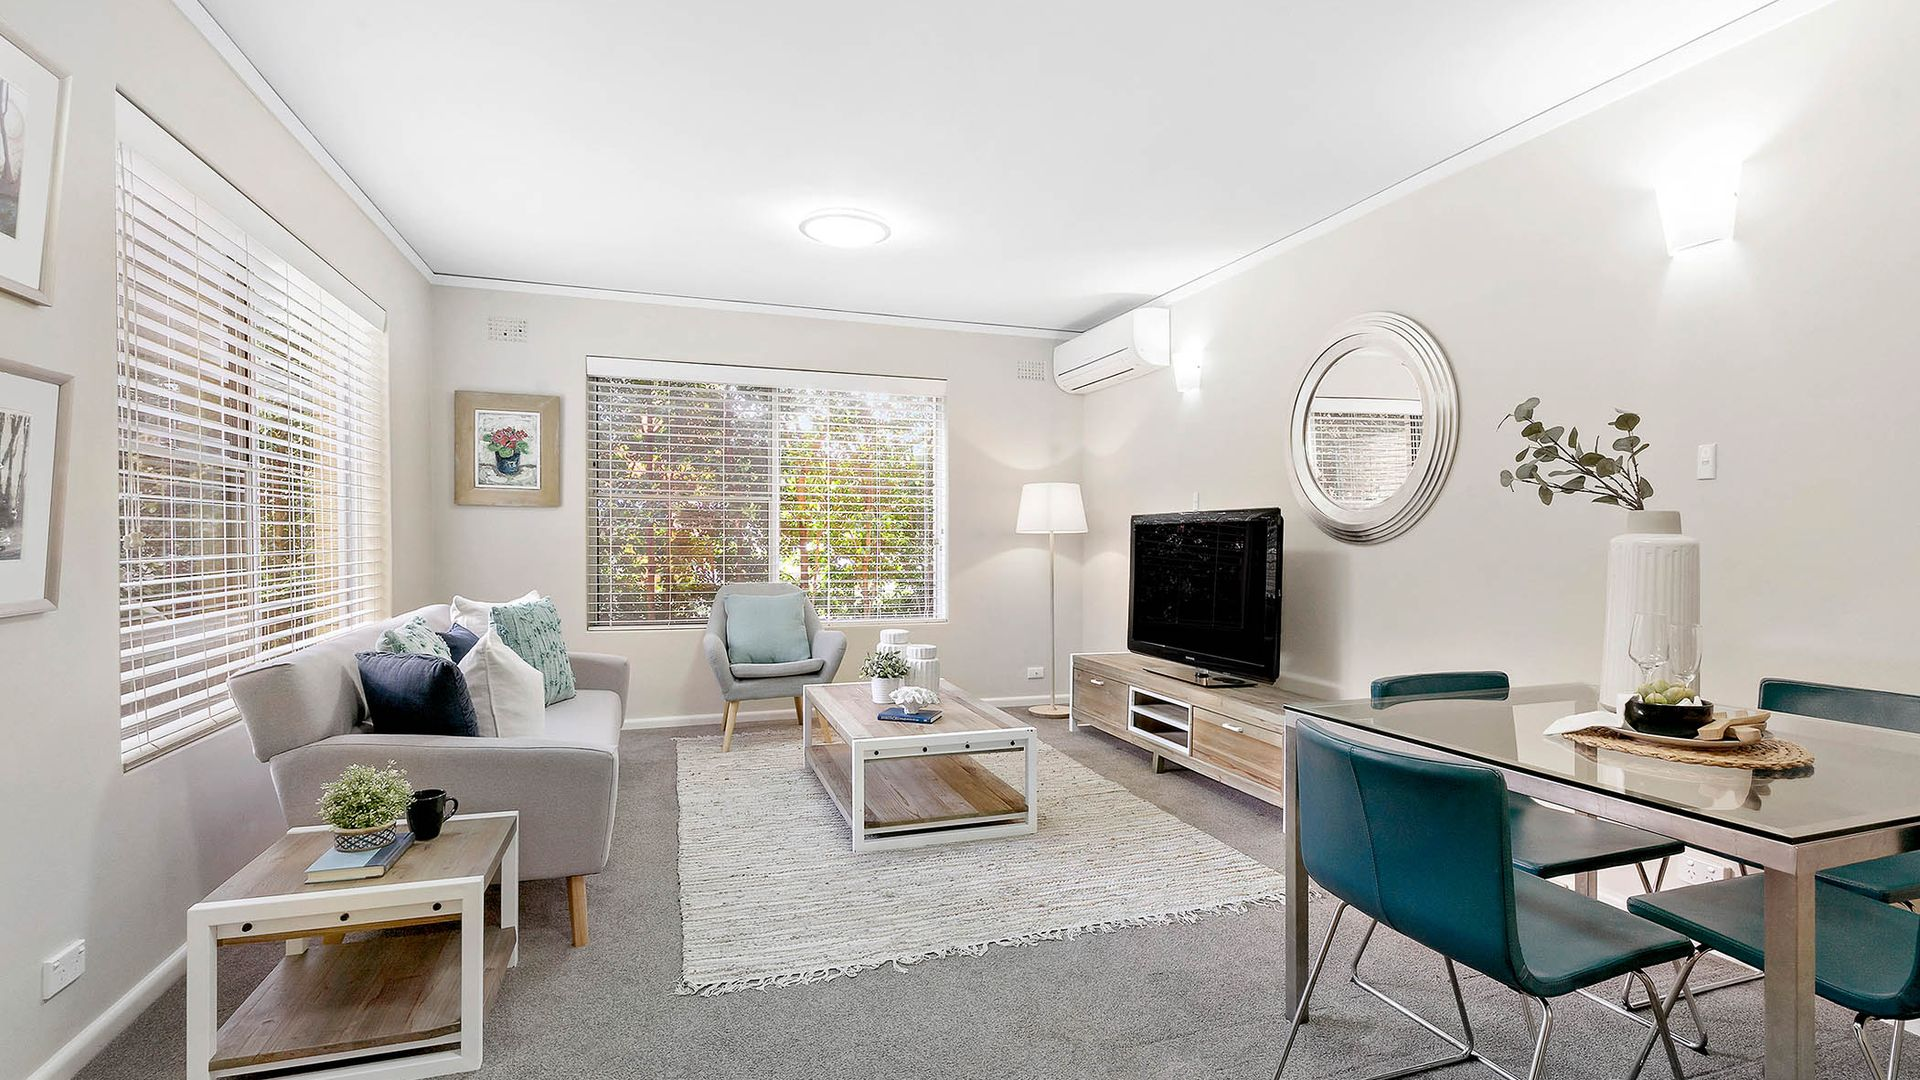 1/5 Marjory Thomas Place, Balgowlah NSW 2093, Image 1